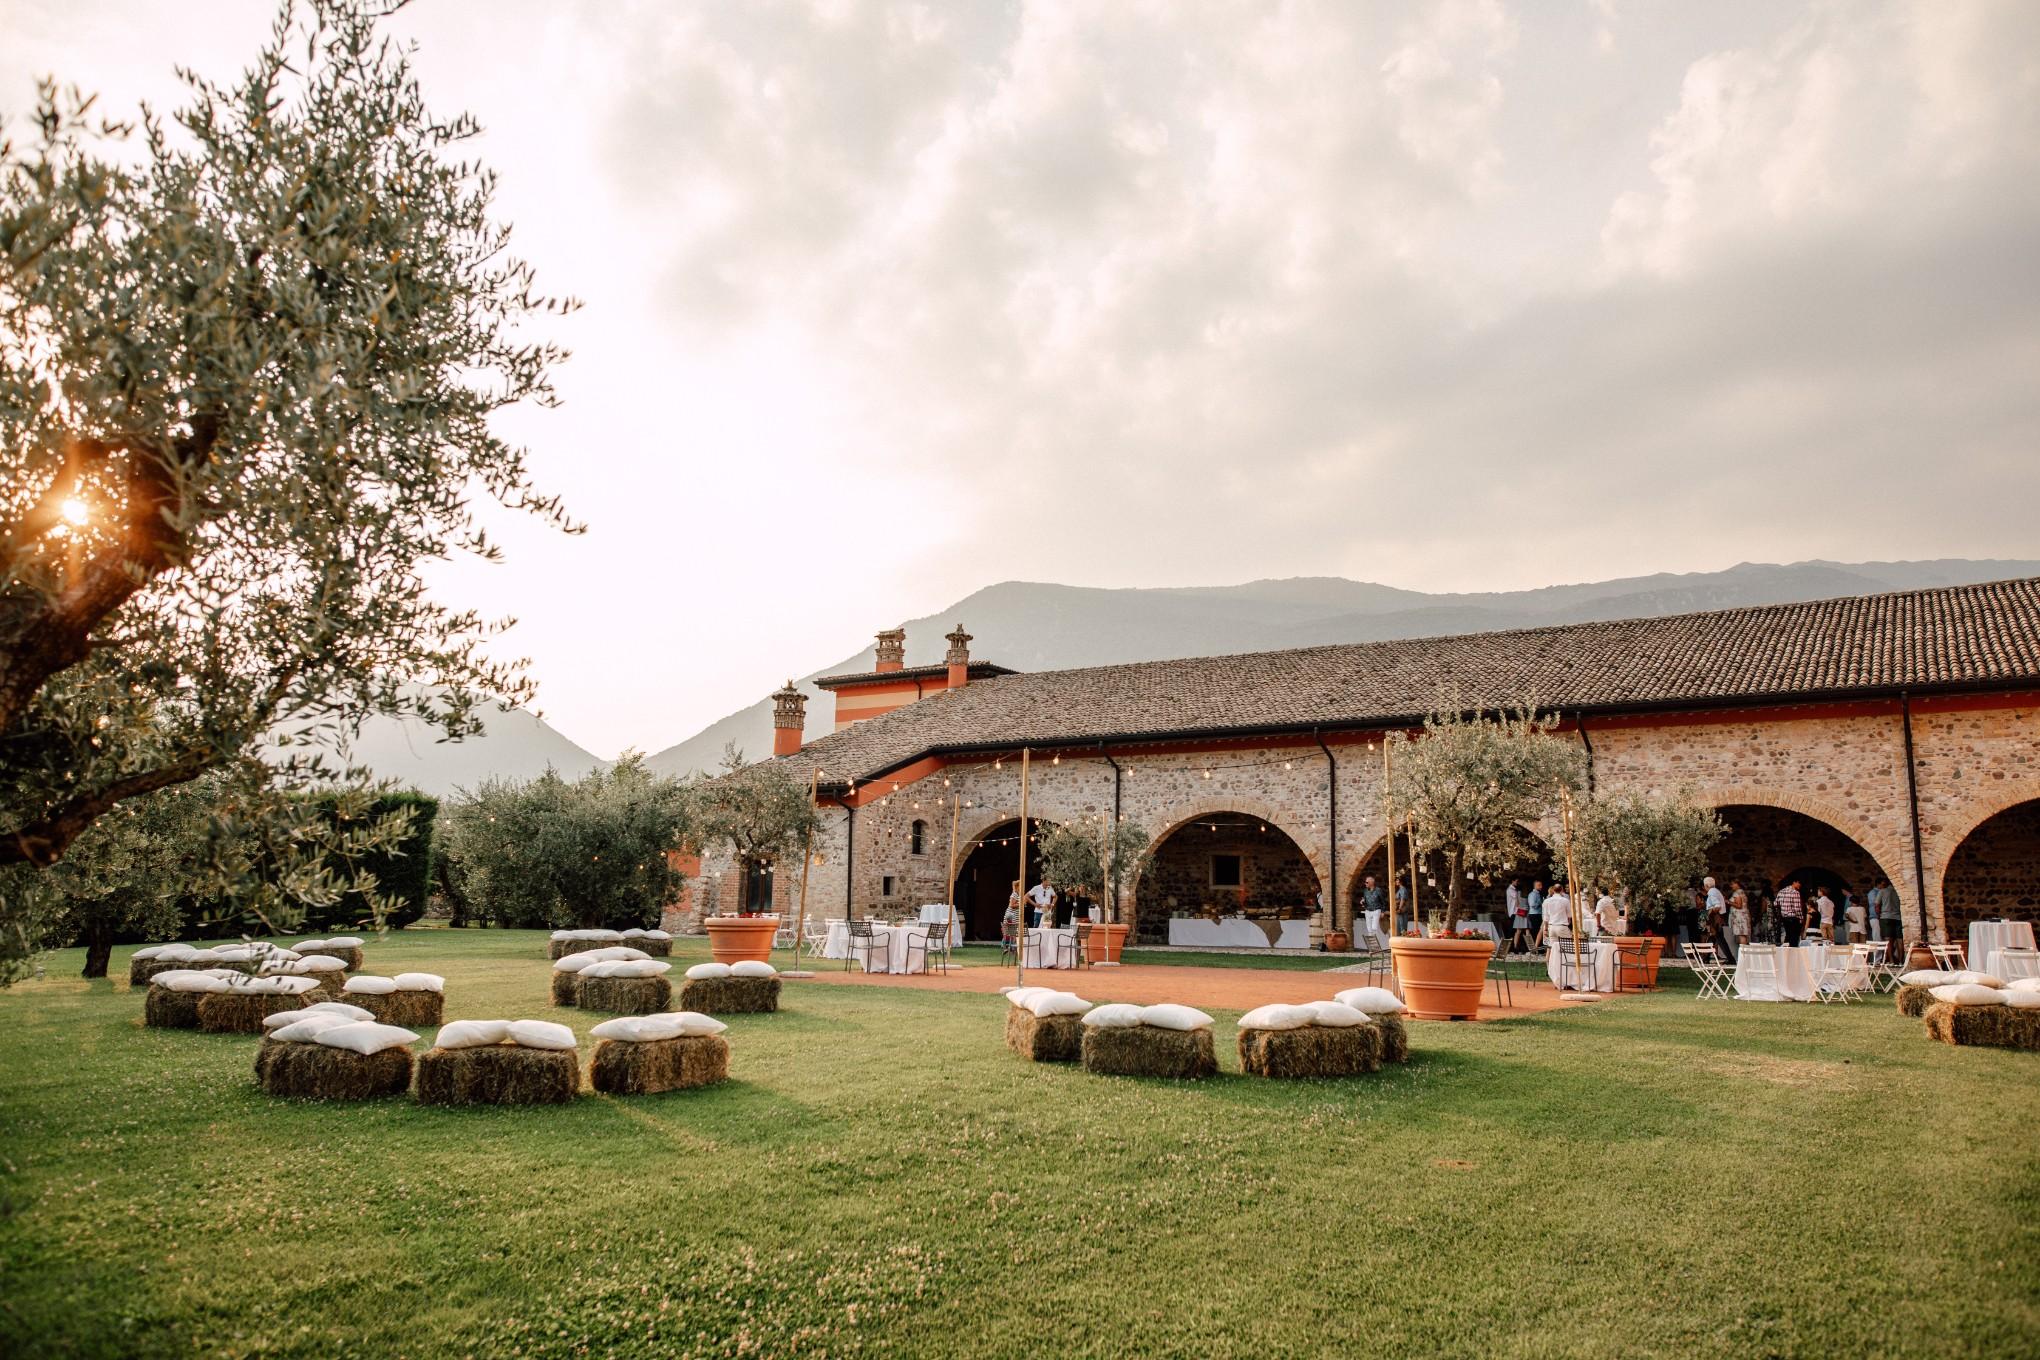 Italy-Gardasee-Tenuta-La-Presa-Pia-Anna-Christian-Photography-BP-GT-17.jpg